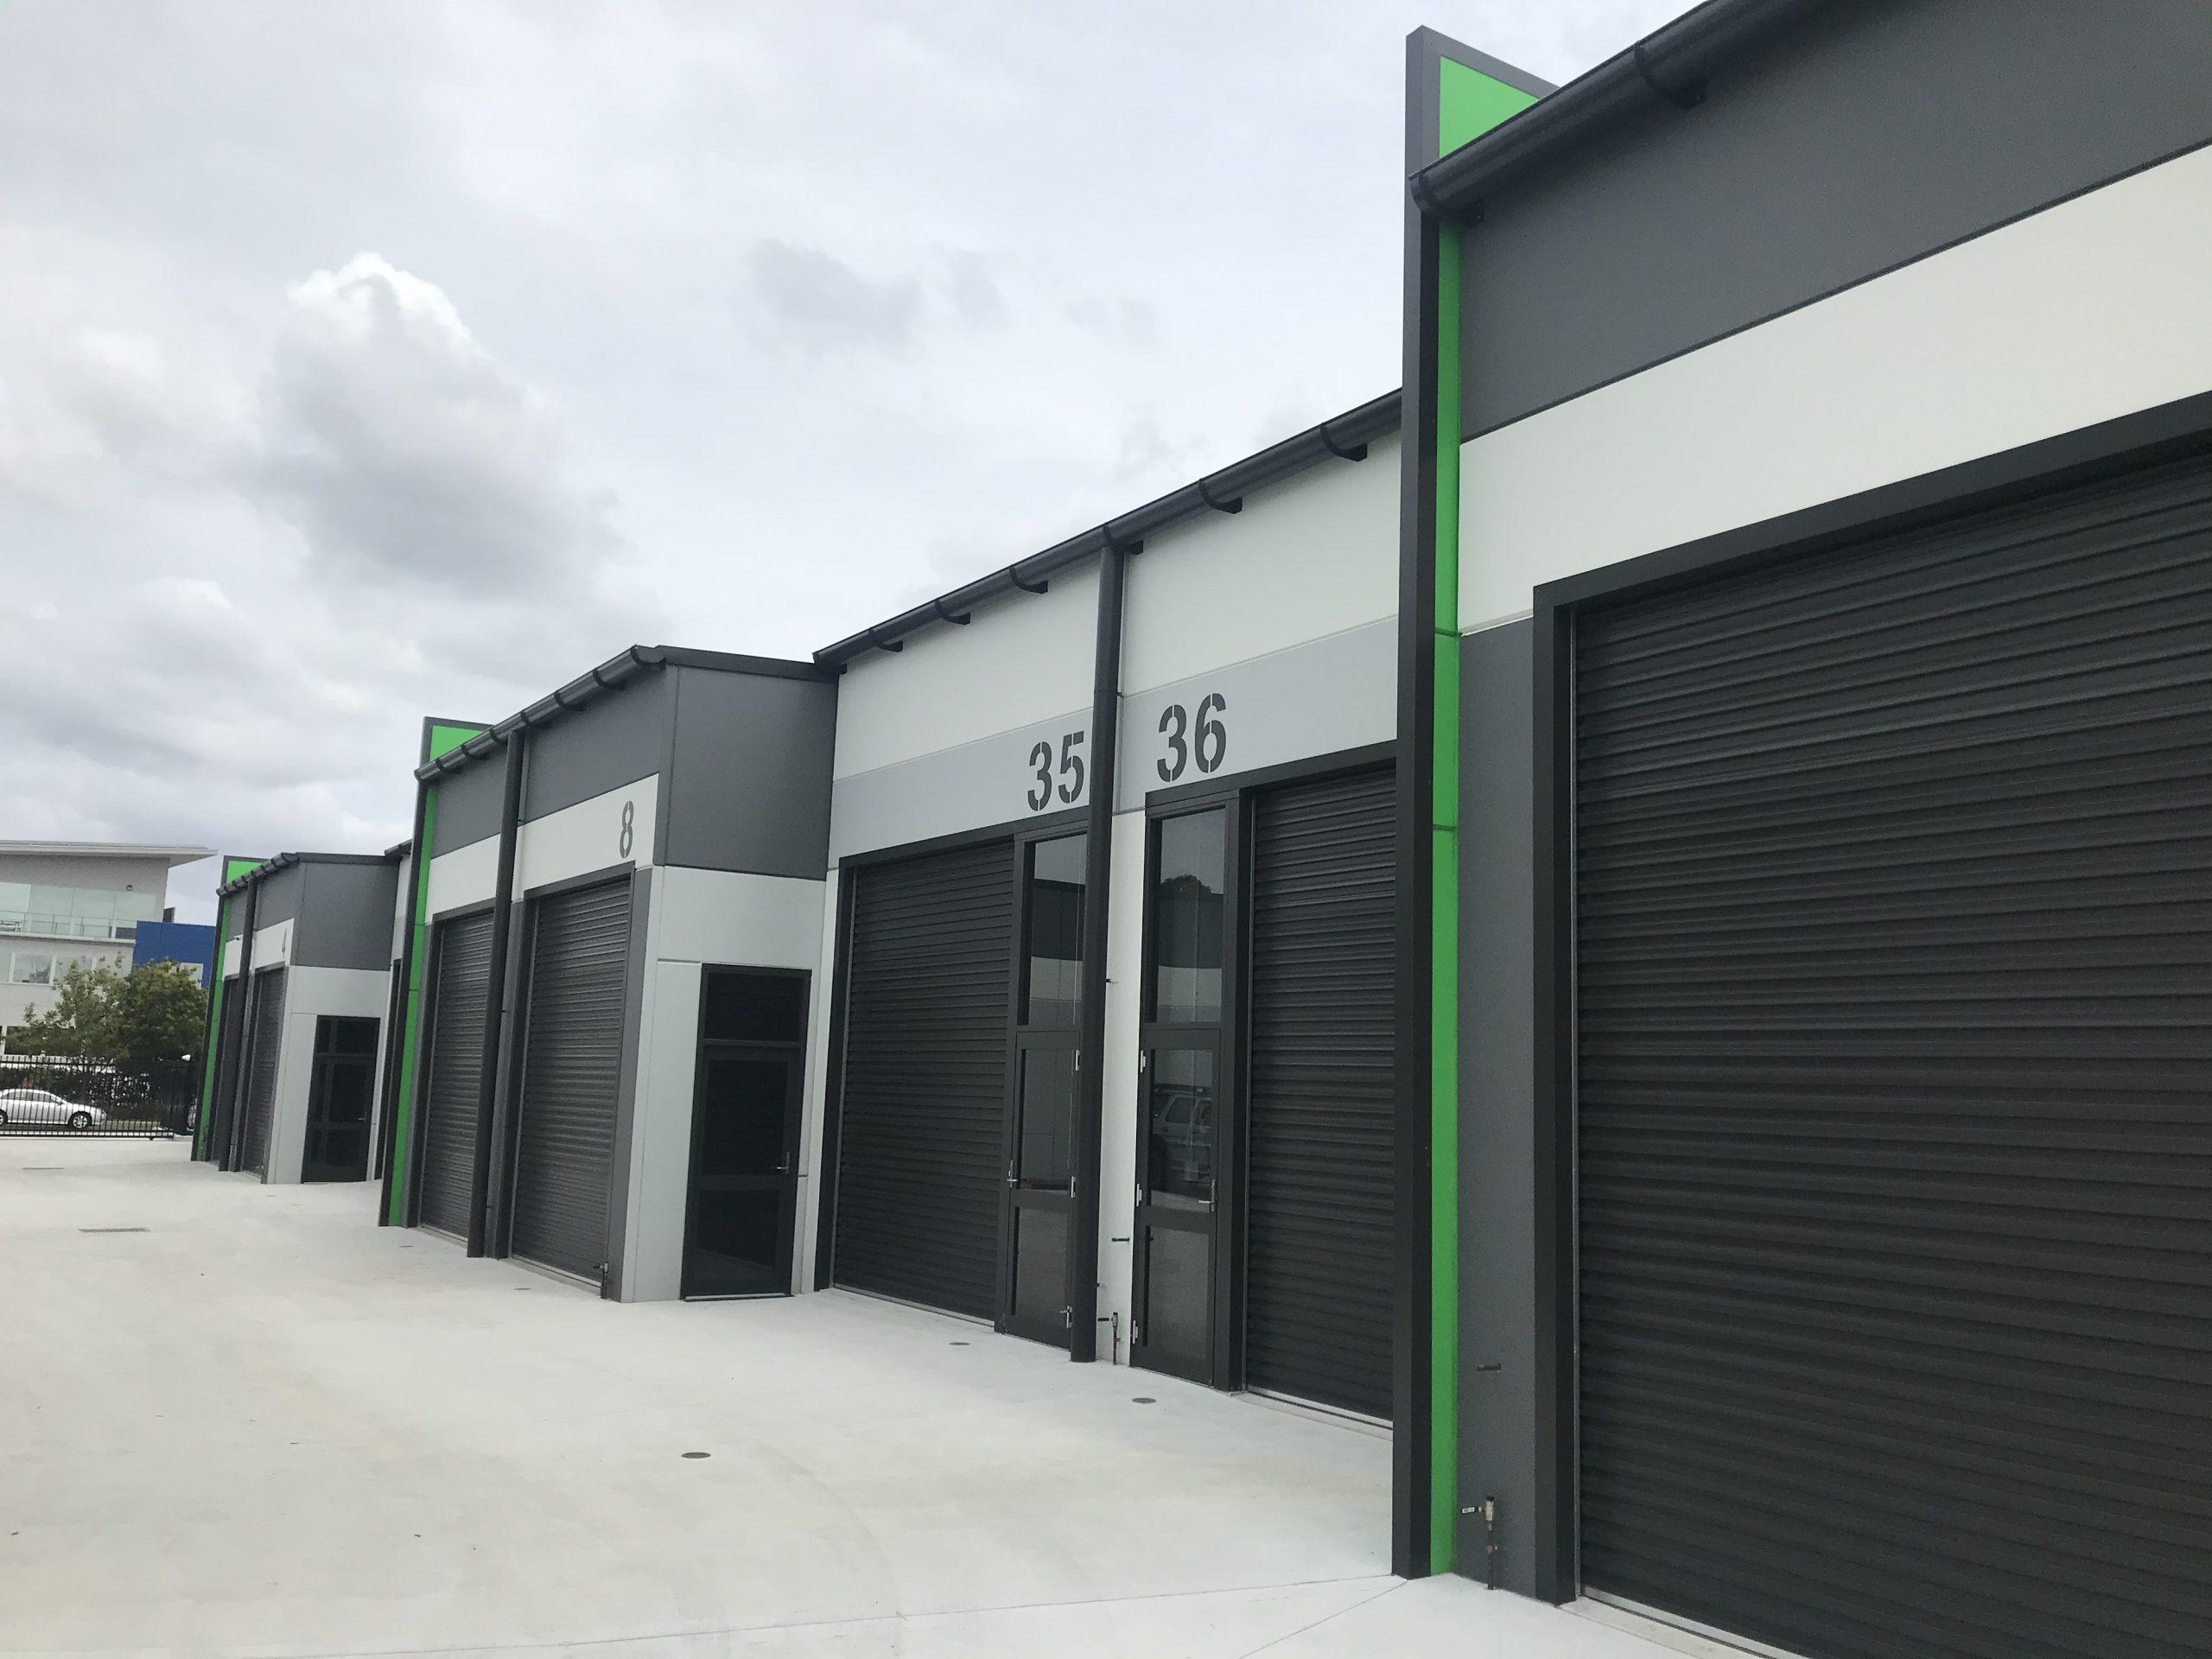 Storage/Warehouse Units x57